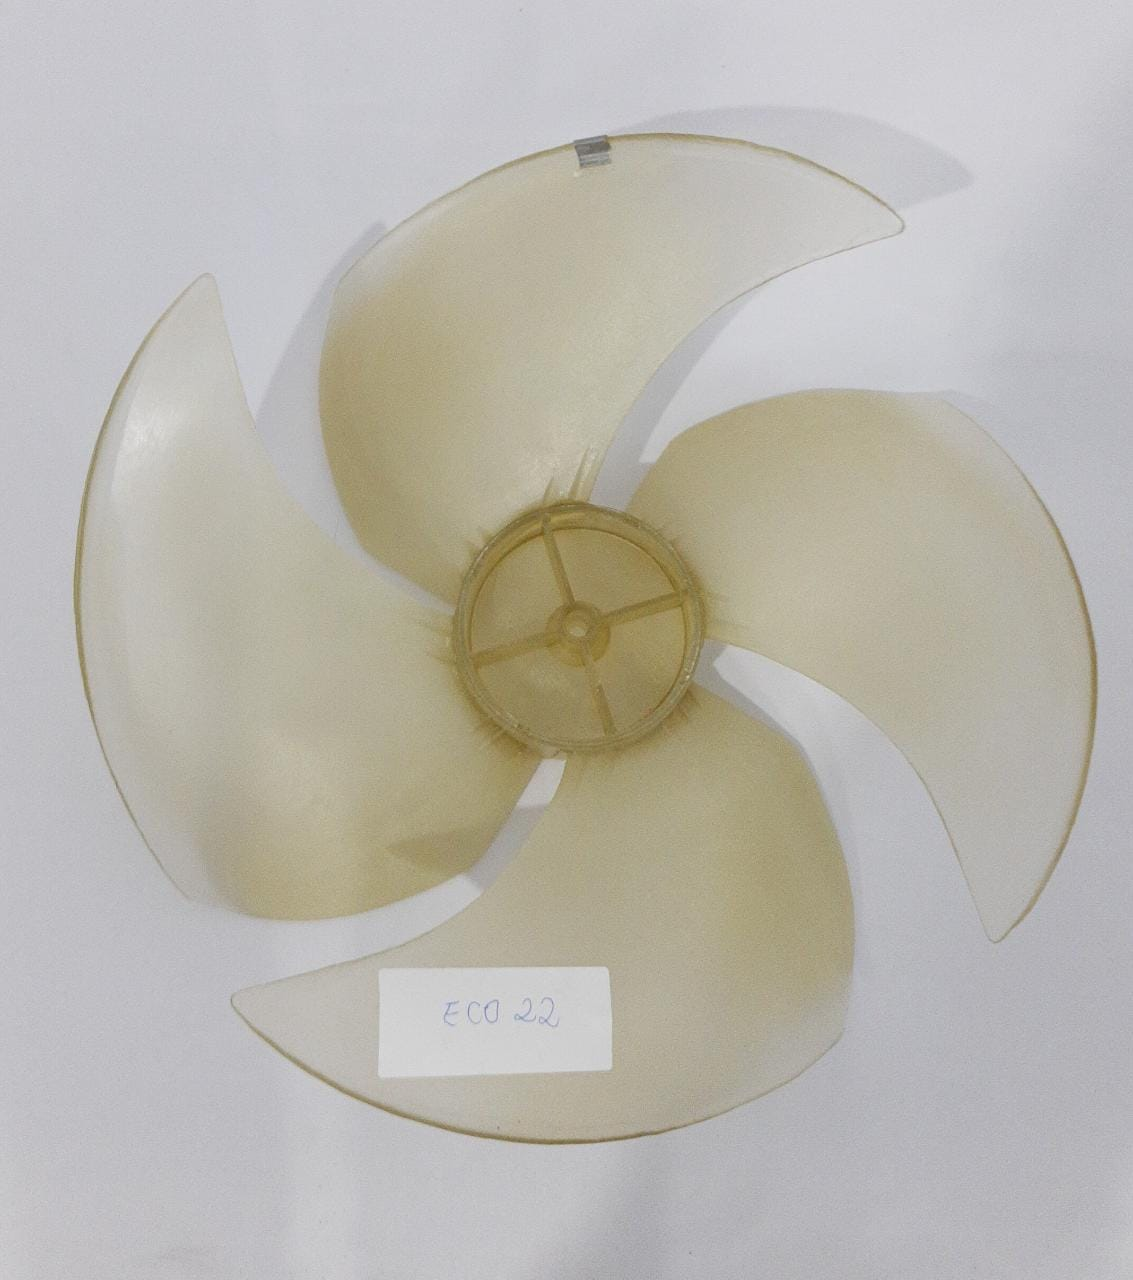 Hélice Condensadora 22.000 Btus Agratto Eco Ecs22 Original